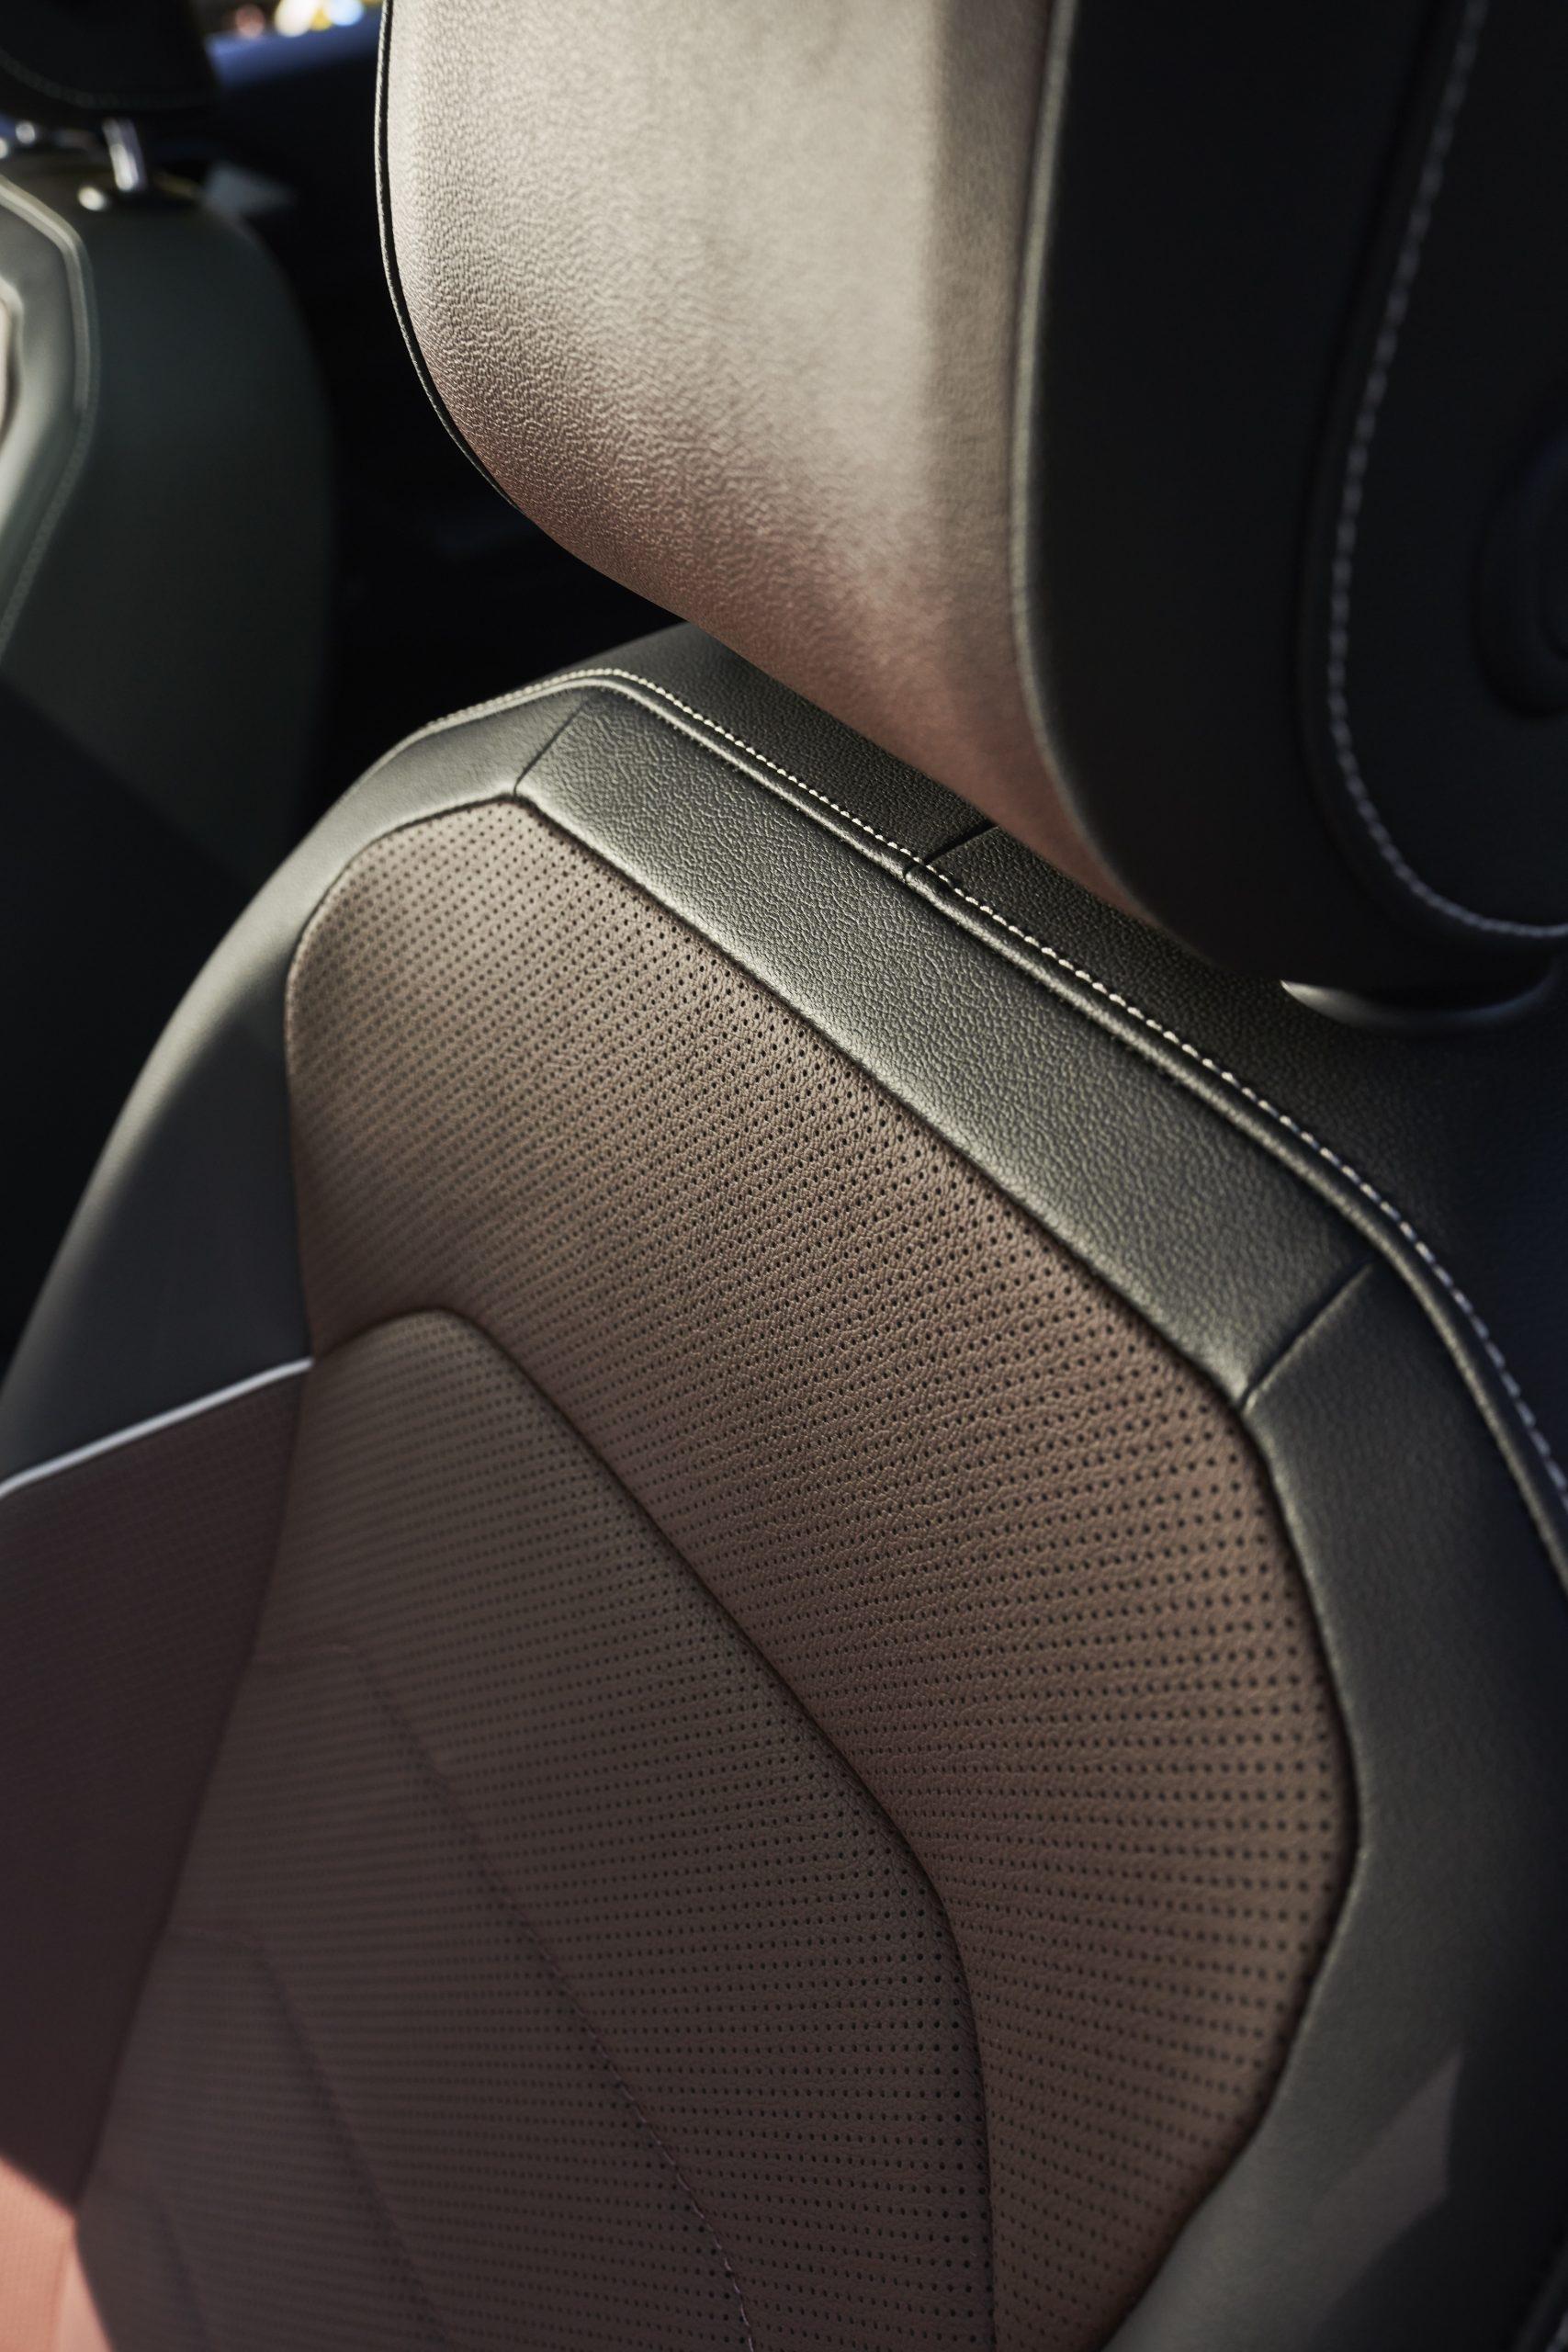 2022 VW Tiguan facelift interior seat leather